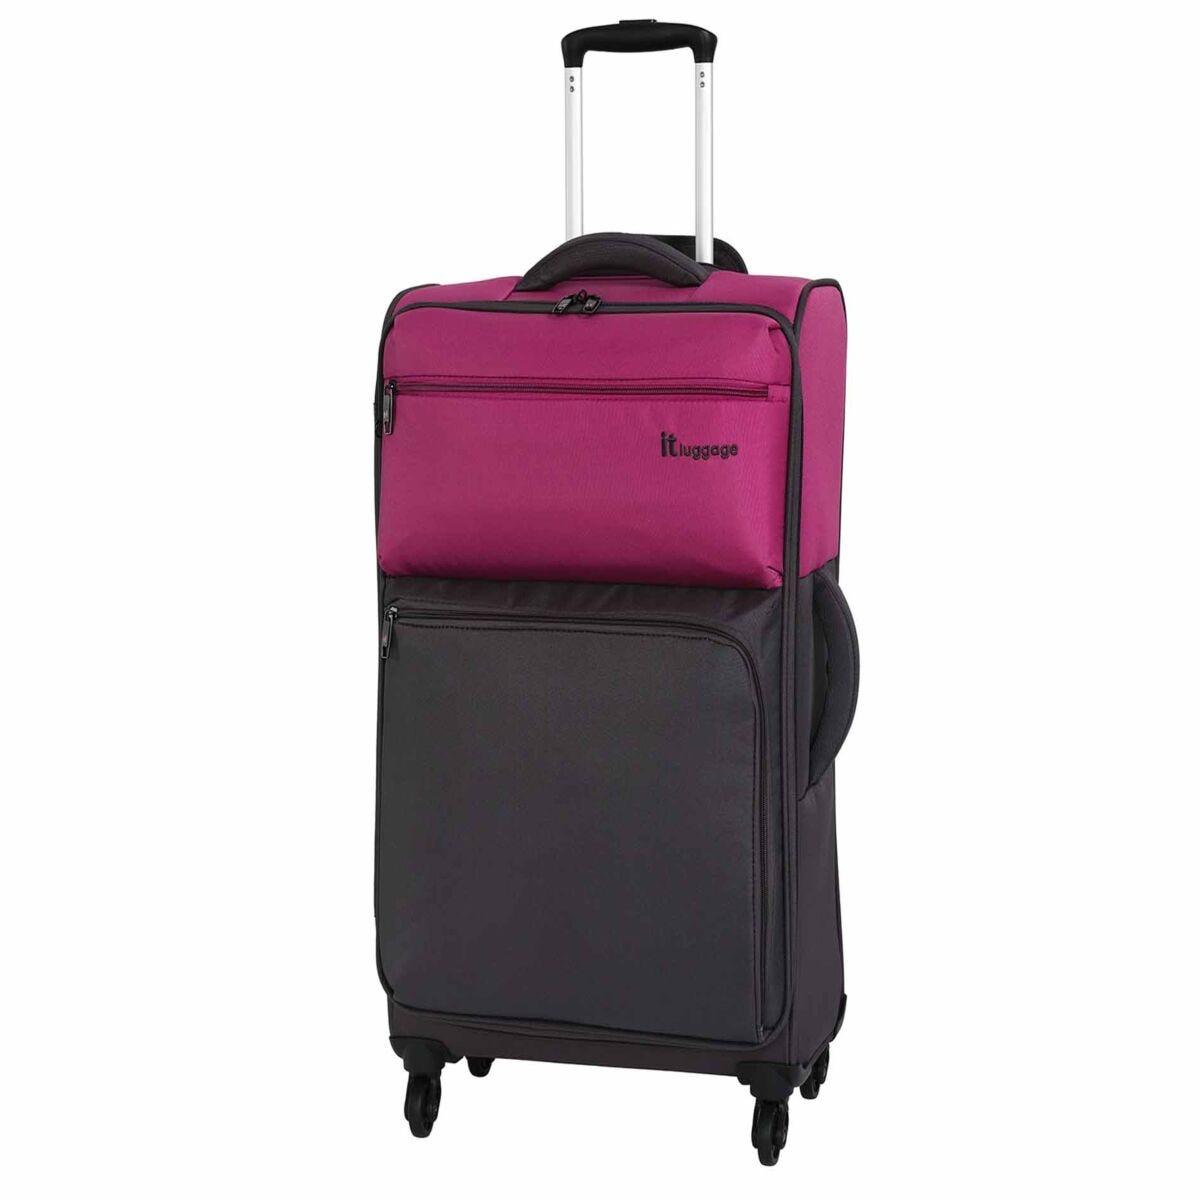 IT Luggage Duo-Tone 4-Wheel Medium Suitcase